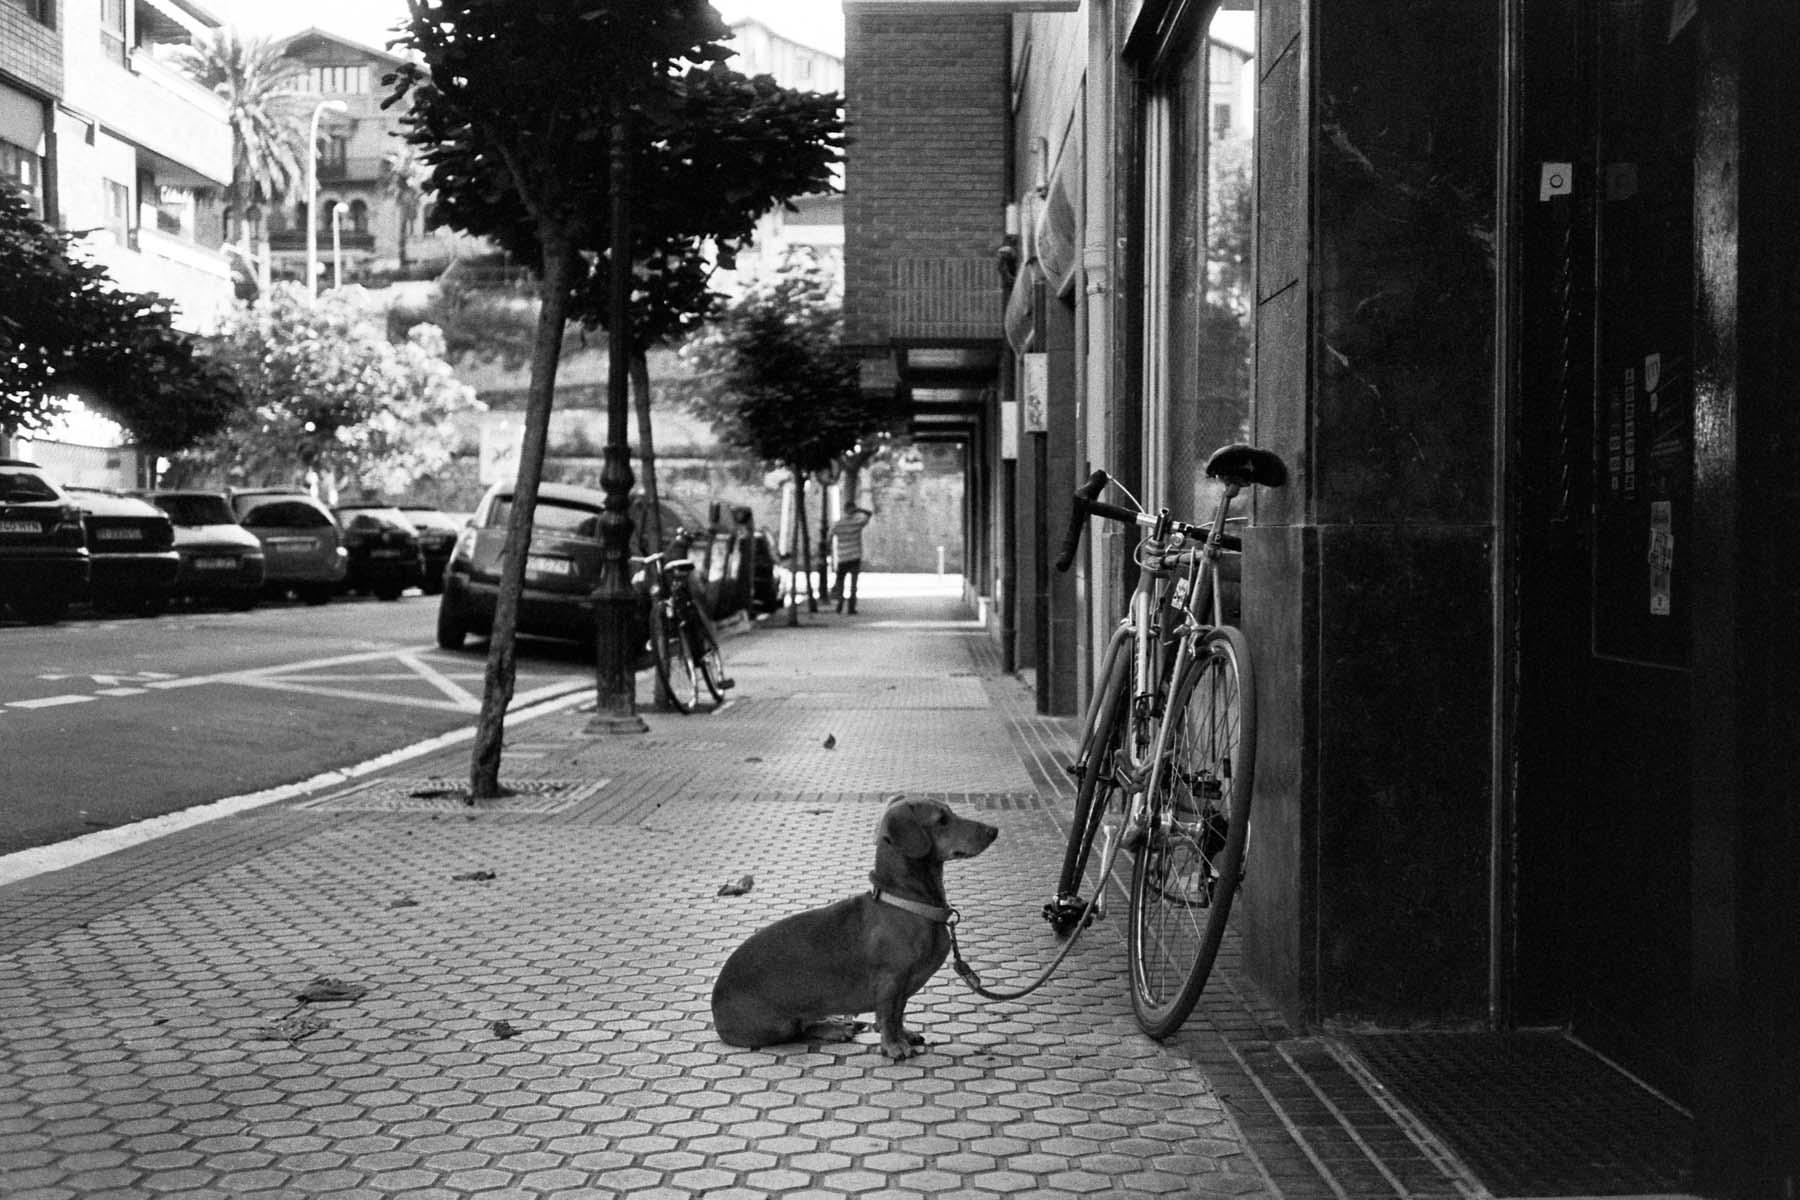 Almost Time | Leica M6 | Zeiss C Biogon 35mm f2.8 | Fomapan 400 | Lilly Schwartz